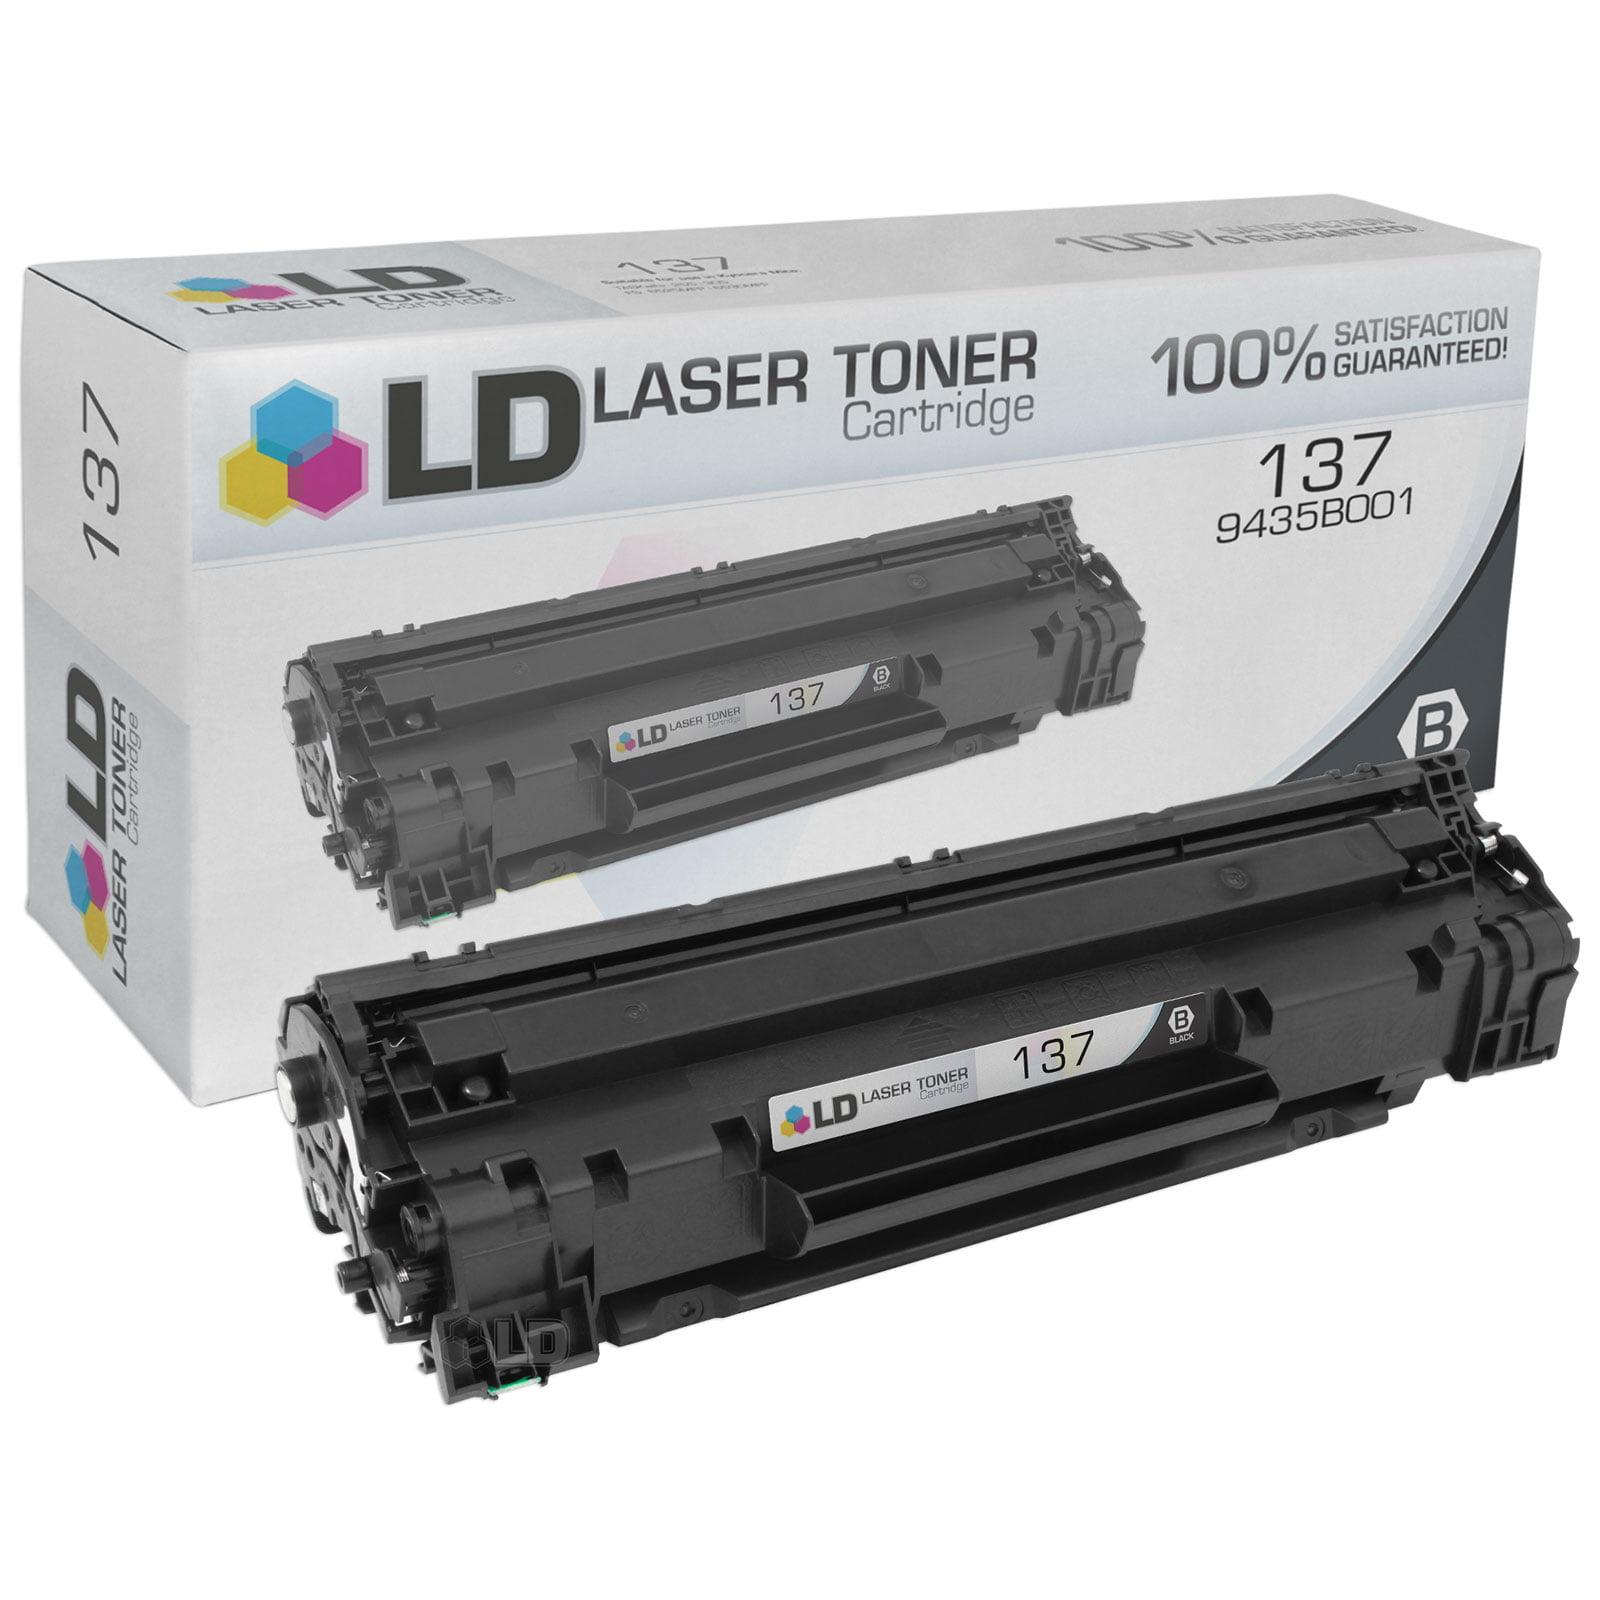 Canon 137 Compatible Black Toner Cartridge 9435B001 CRG137 Printer ImageClass MF212w MF216n MF227dw MF229dw LBP151dw MF244dw MF232w MF247dw